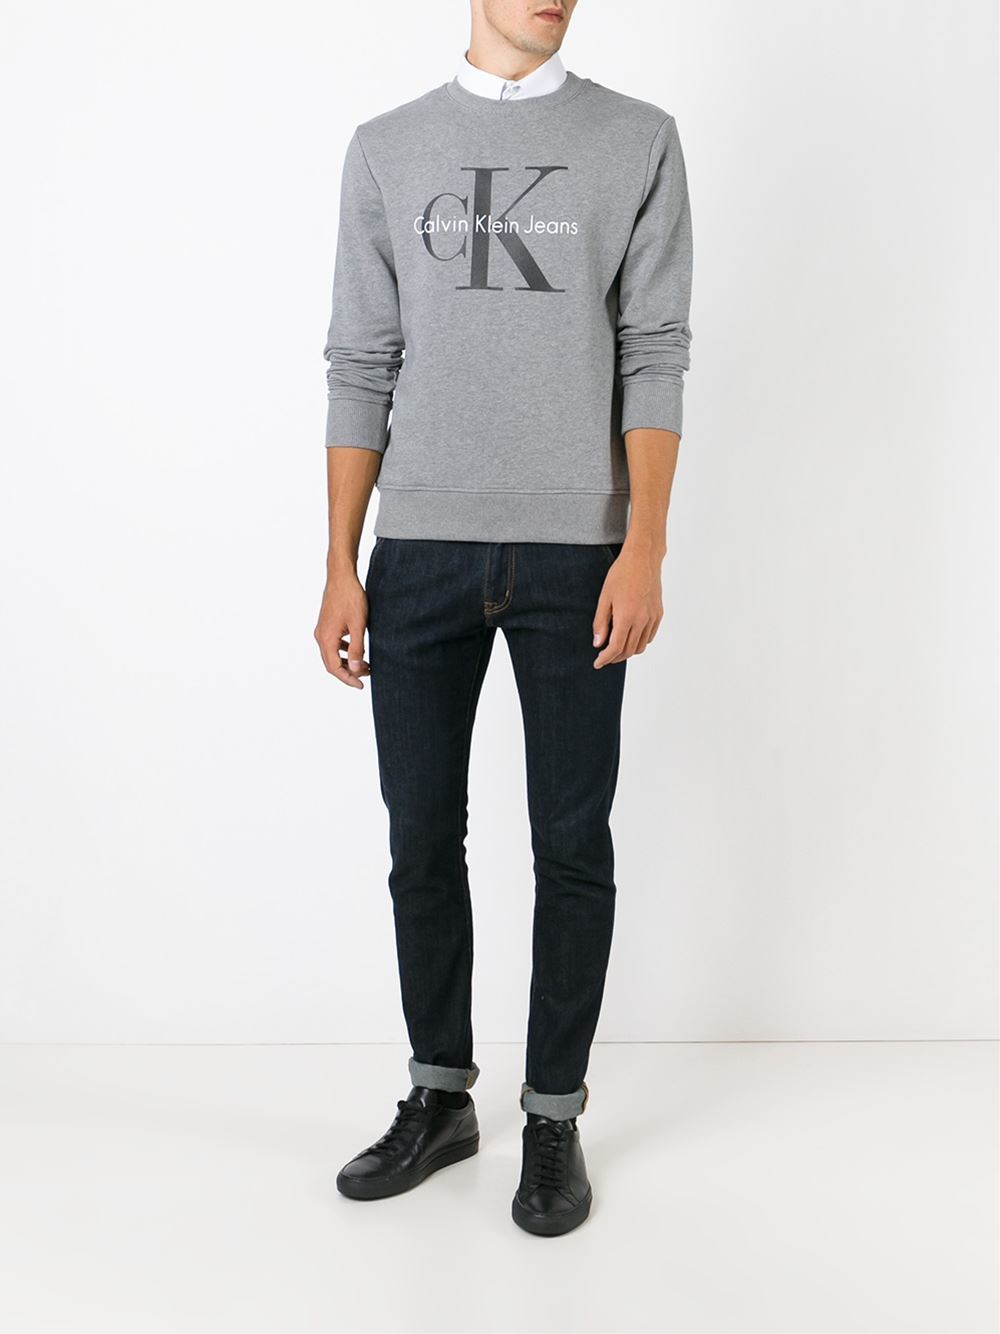 calvin klein jeans logo print sweatshirt in gray for men. Black Bedroom Furniture Sets. Home Design Ideas